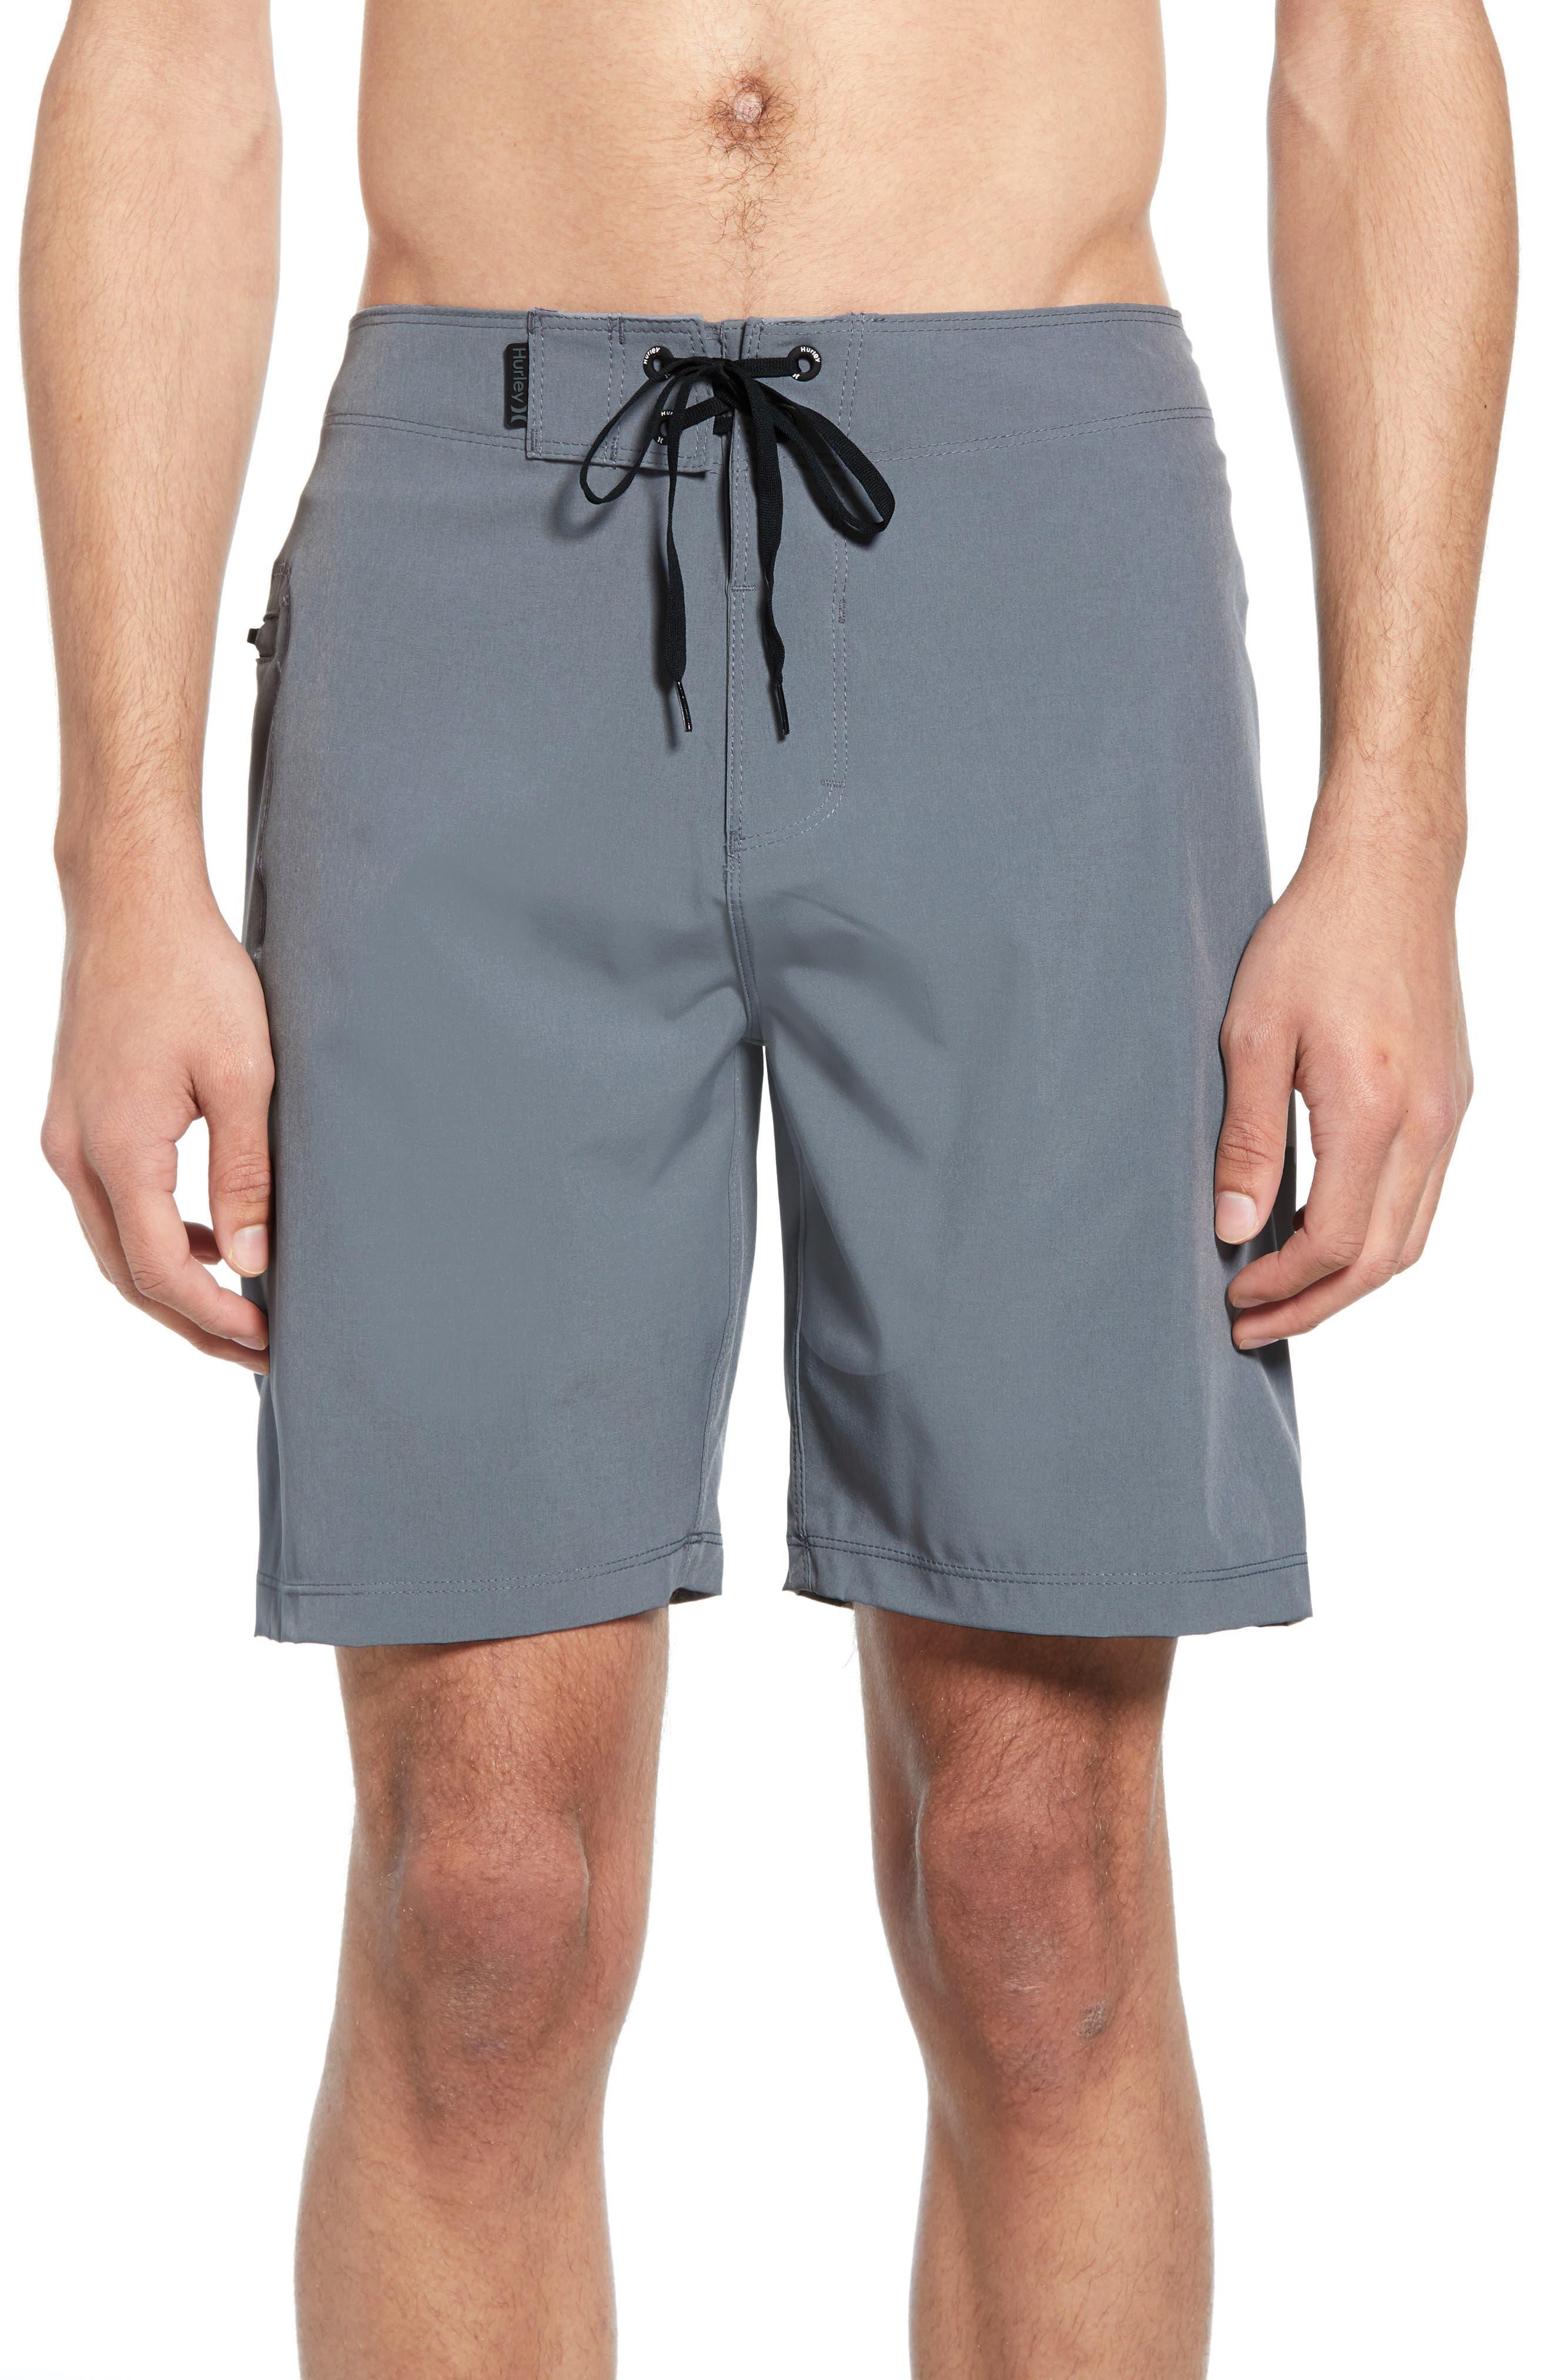 Hurley Phantom One & Only Board Shorts, Grey